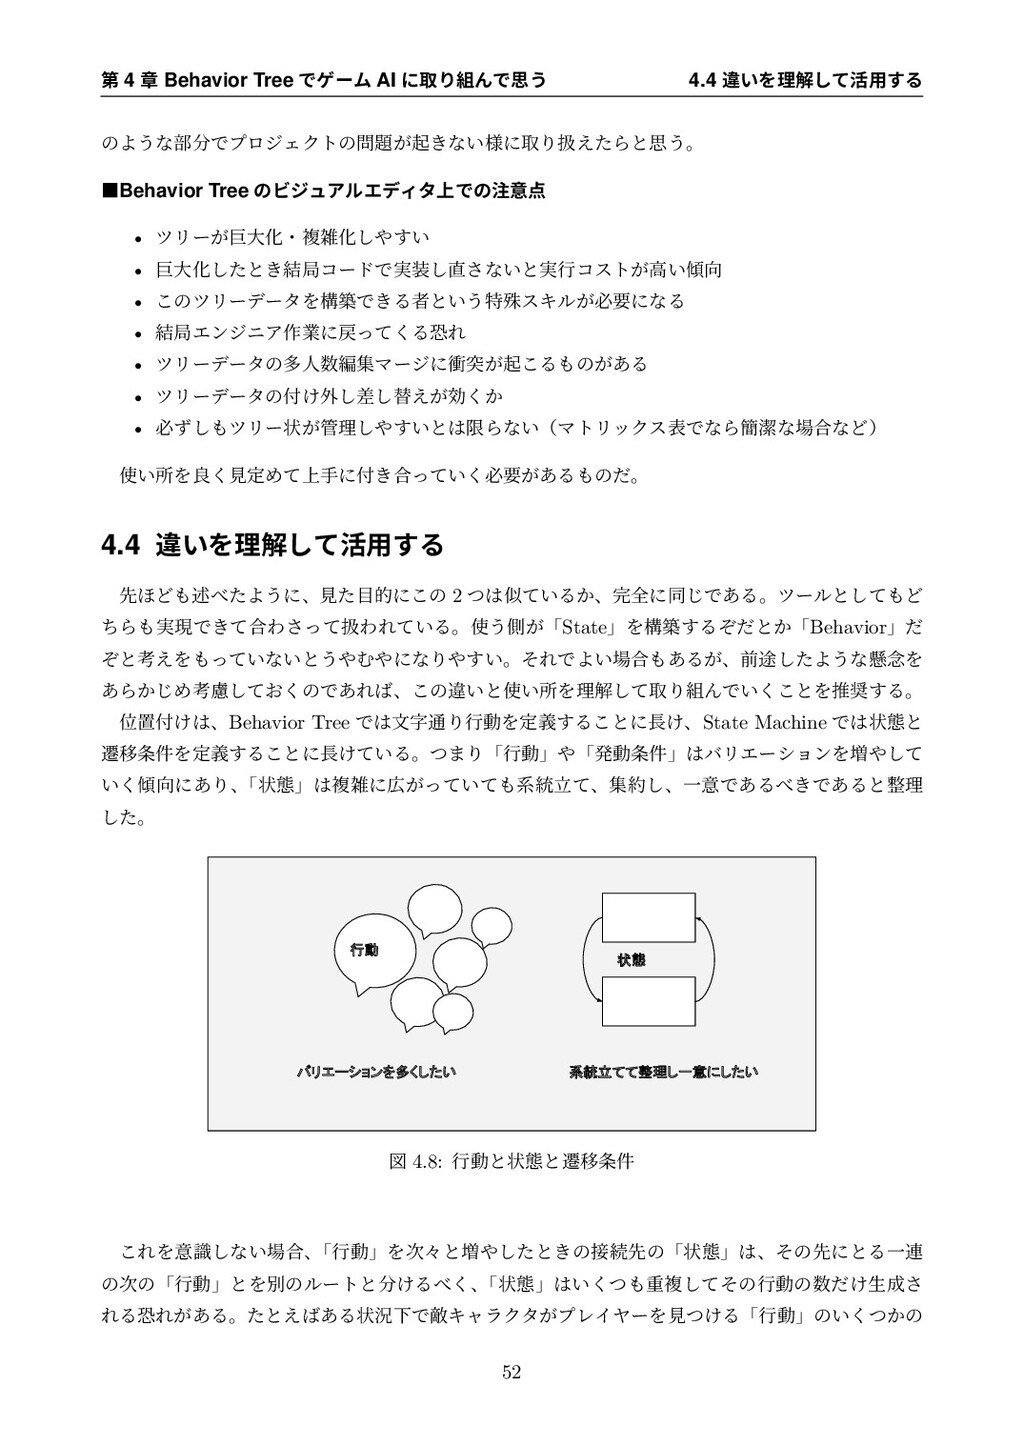 ୈ 4 ষ Behavior Tree ͰήʔϜ AI ʹऔΓΜͰࢥ͏ 4.4 ҧ͍Λཧղ͠...